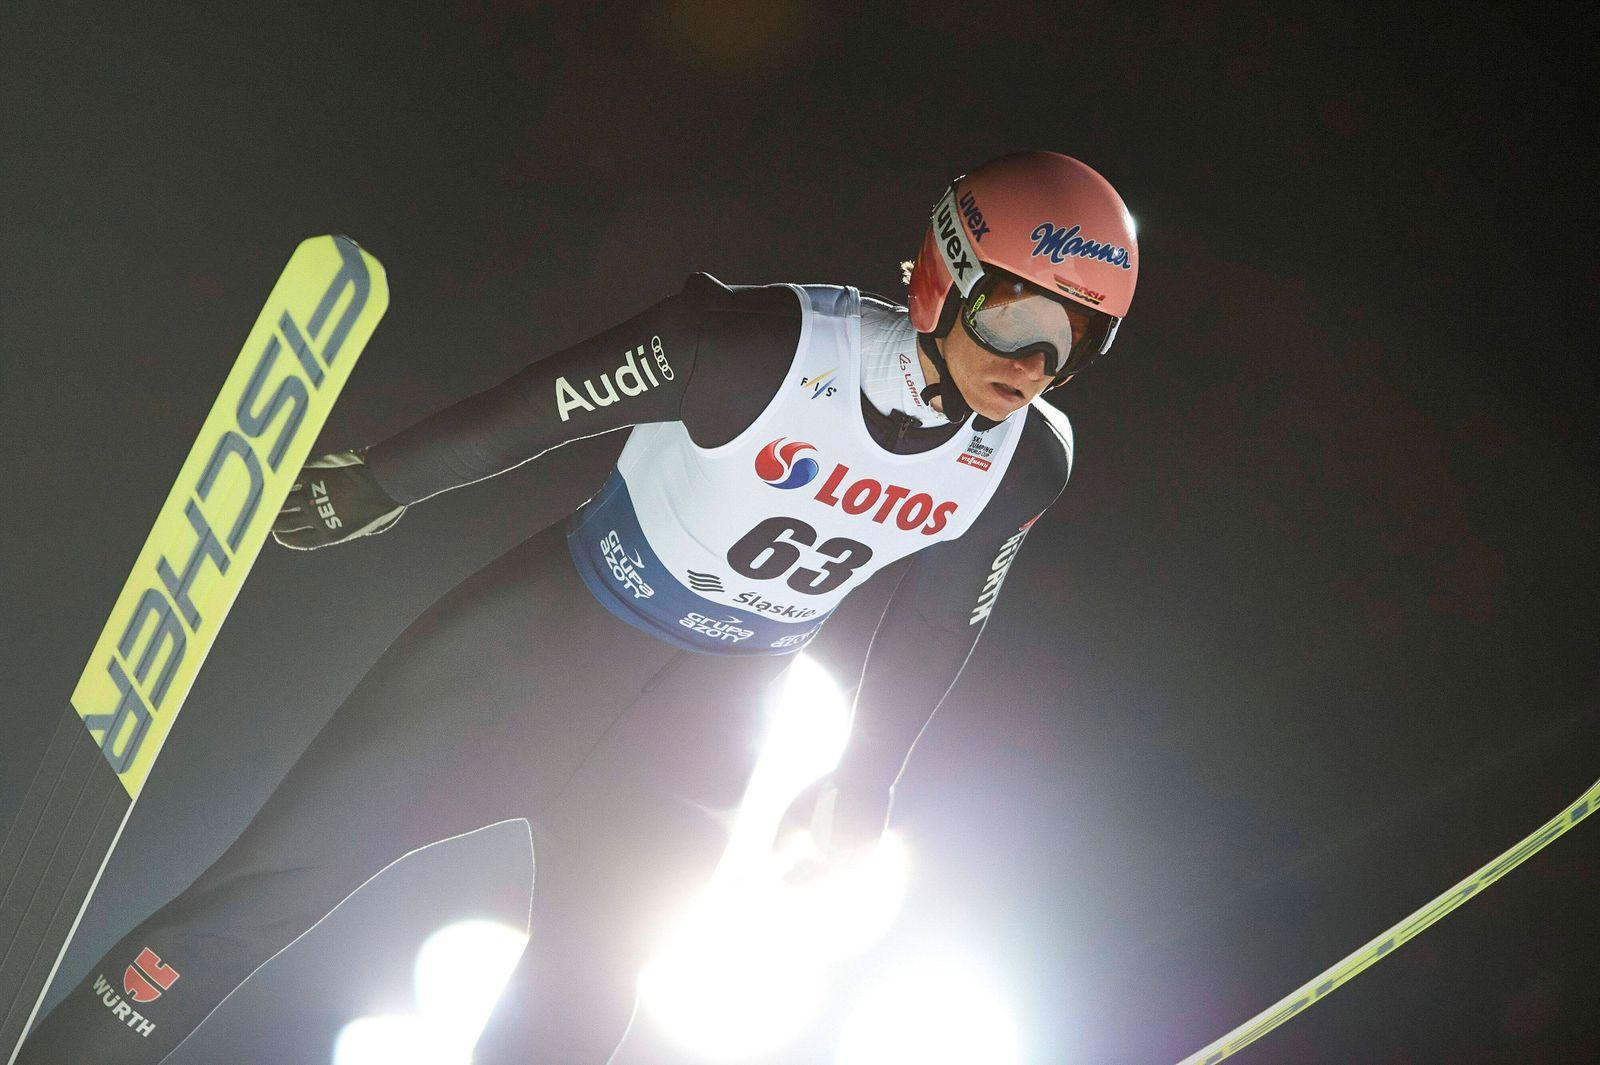 20.11.2020 WISLA , PUCHAR SWIATA W SKOKACH NARCIARSKICH WISLA MALINKA 2020 (VIESSMANN FIS Ski jumping, Skispringen, Ski,